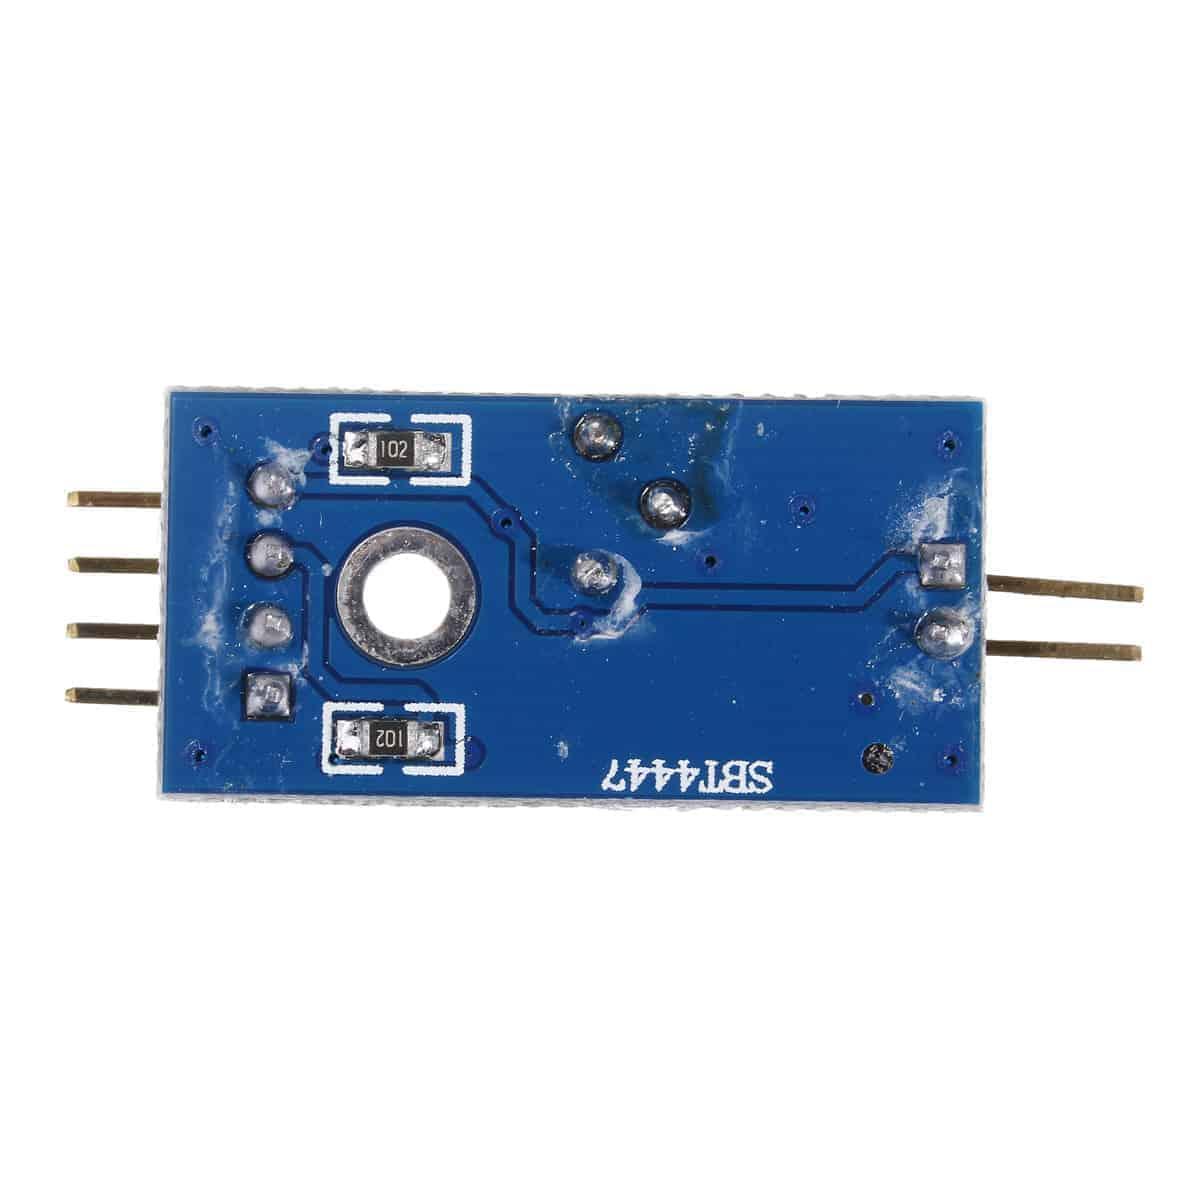 Raindrop Detection Sensor Module Humidity Rain Drop For Arduino PI #174784